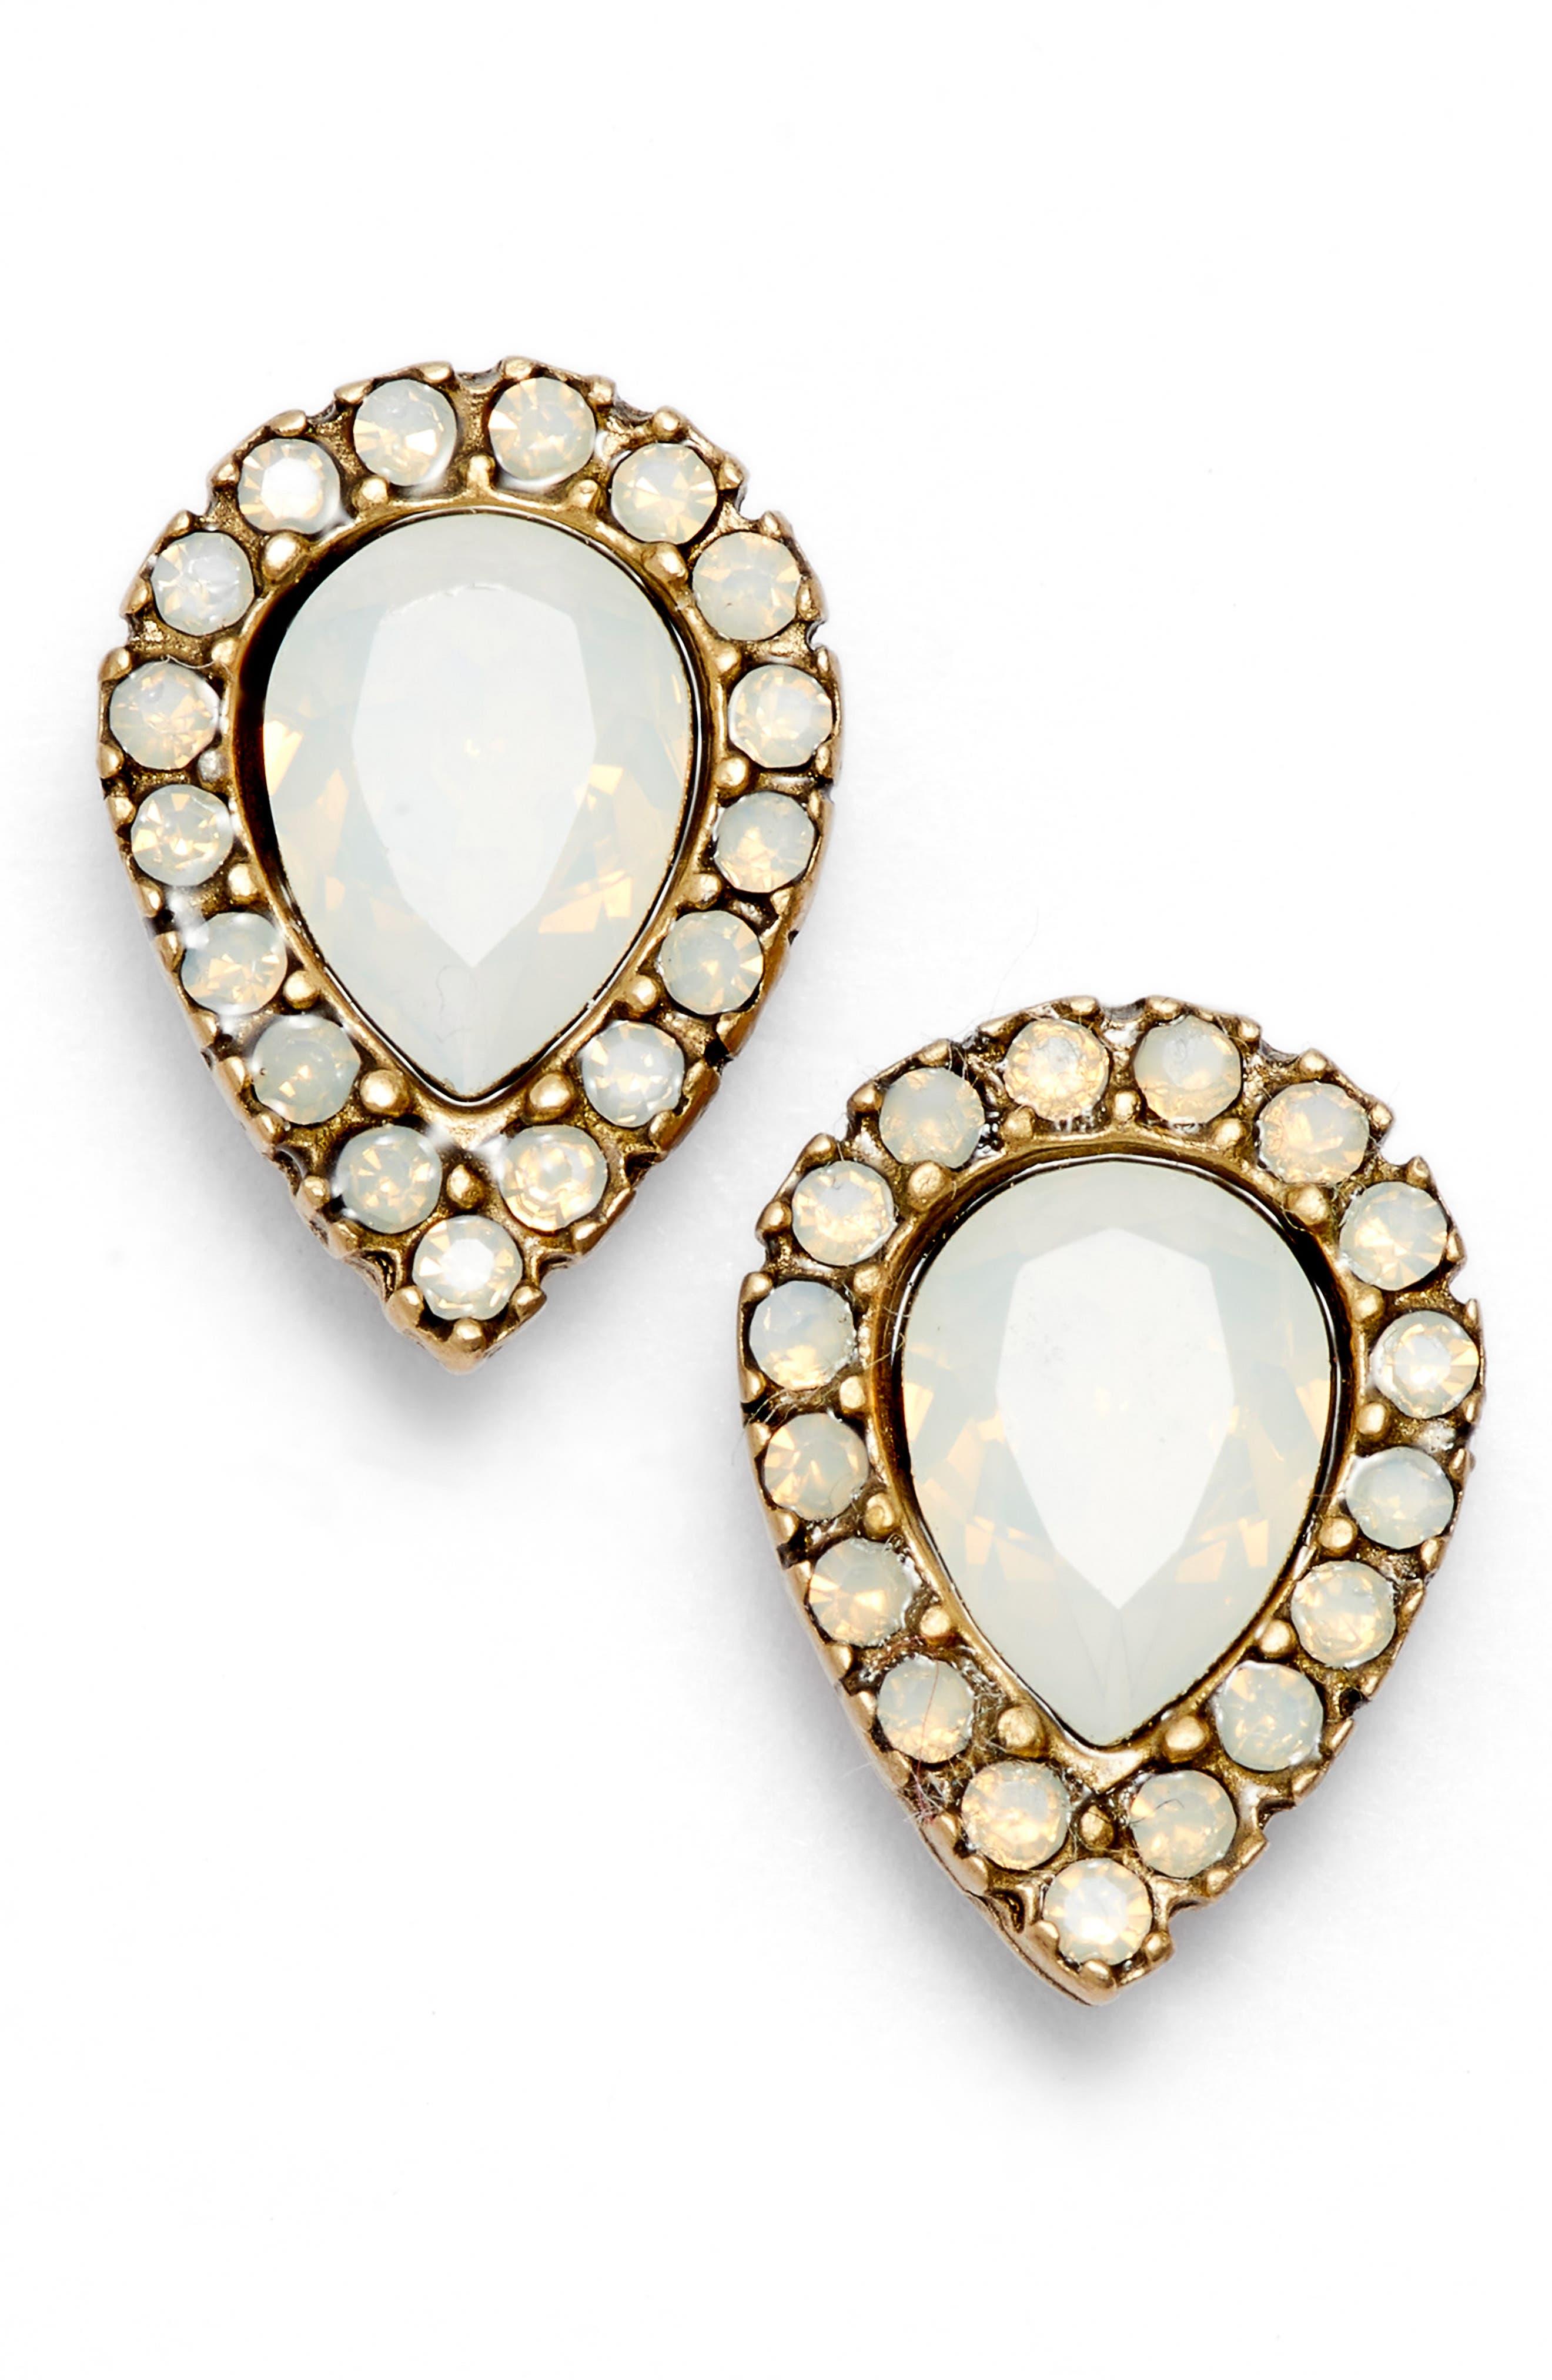 Jamie Teardrop Stud Earrings,                             Main thumbnail 1, color,                             GOLD/ WHITE